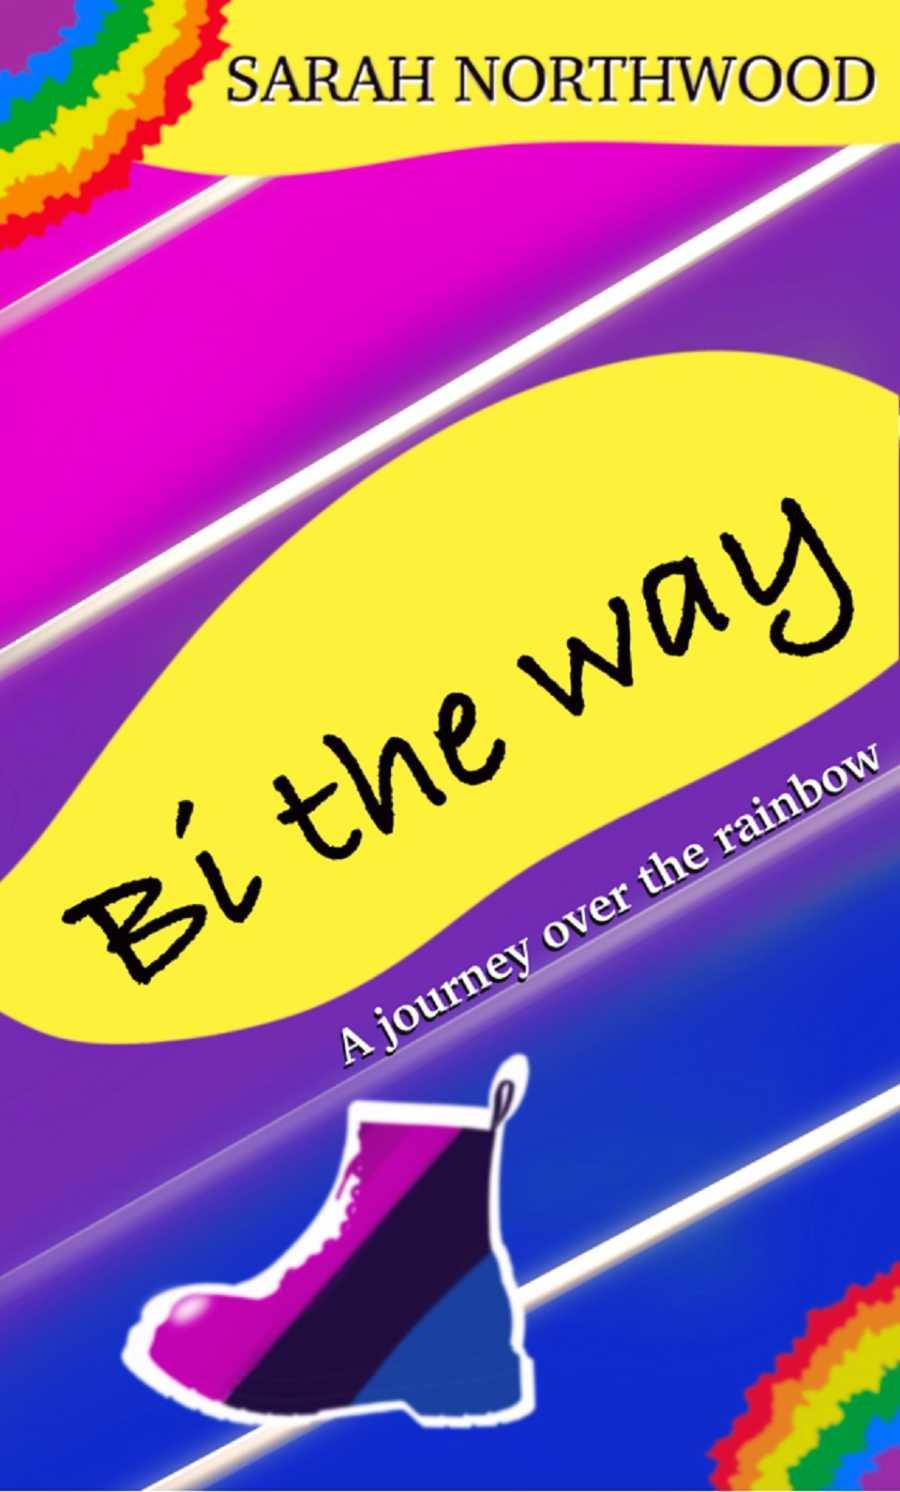 A brightly colored book cover